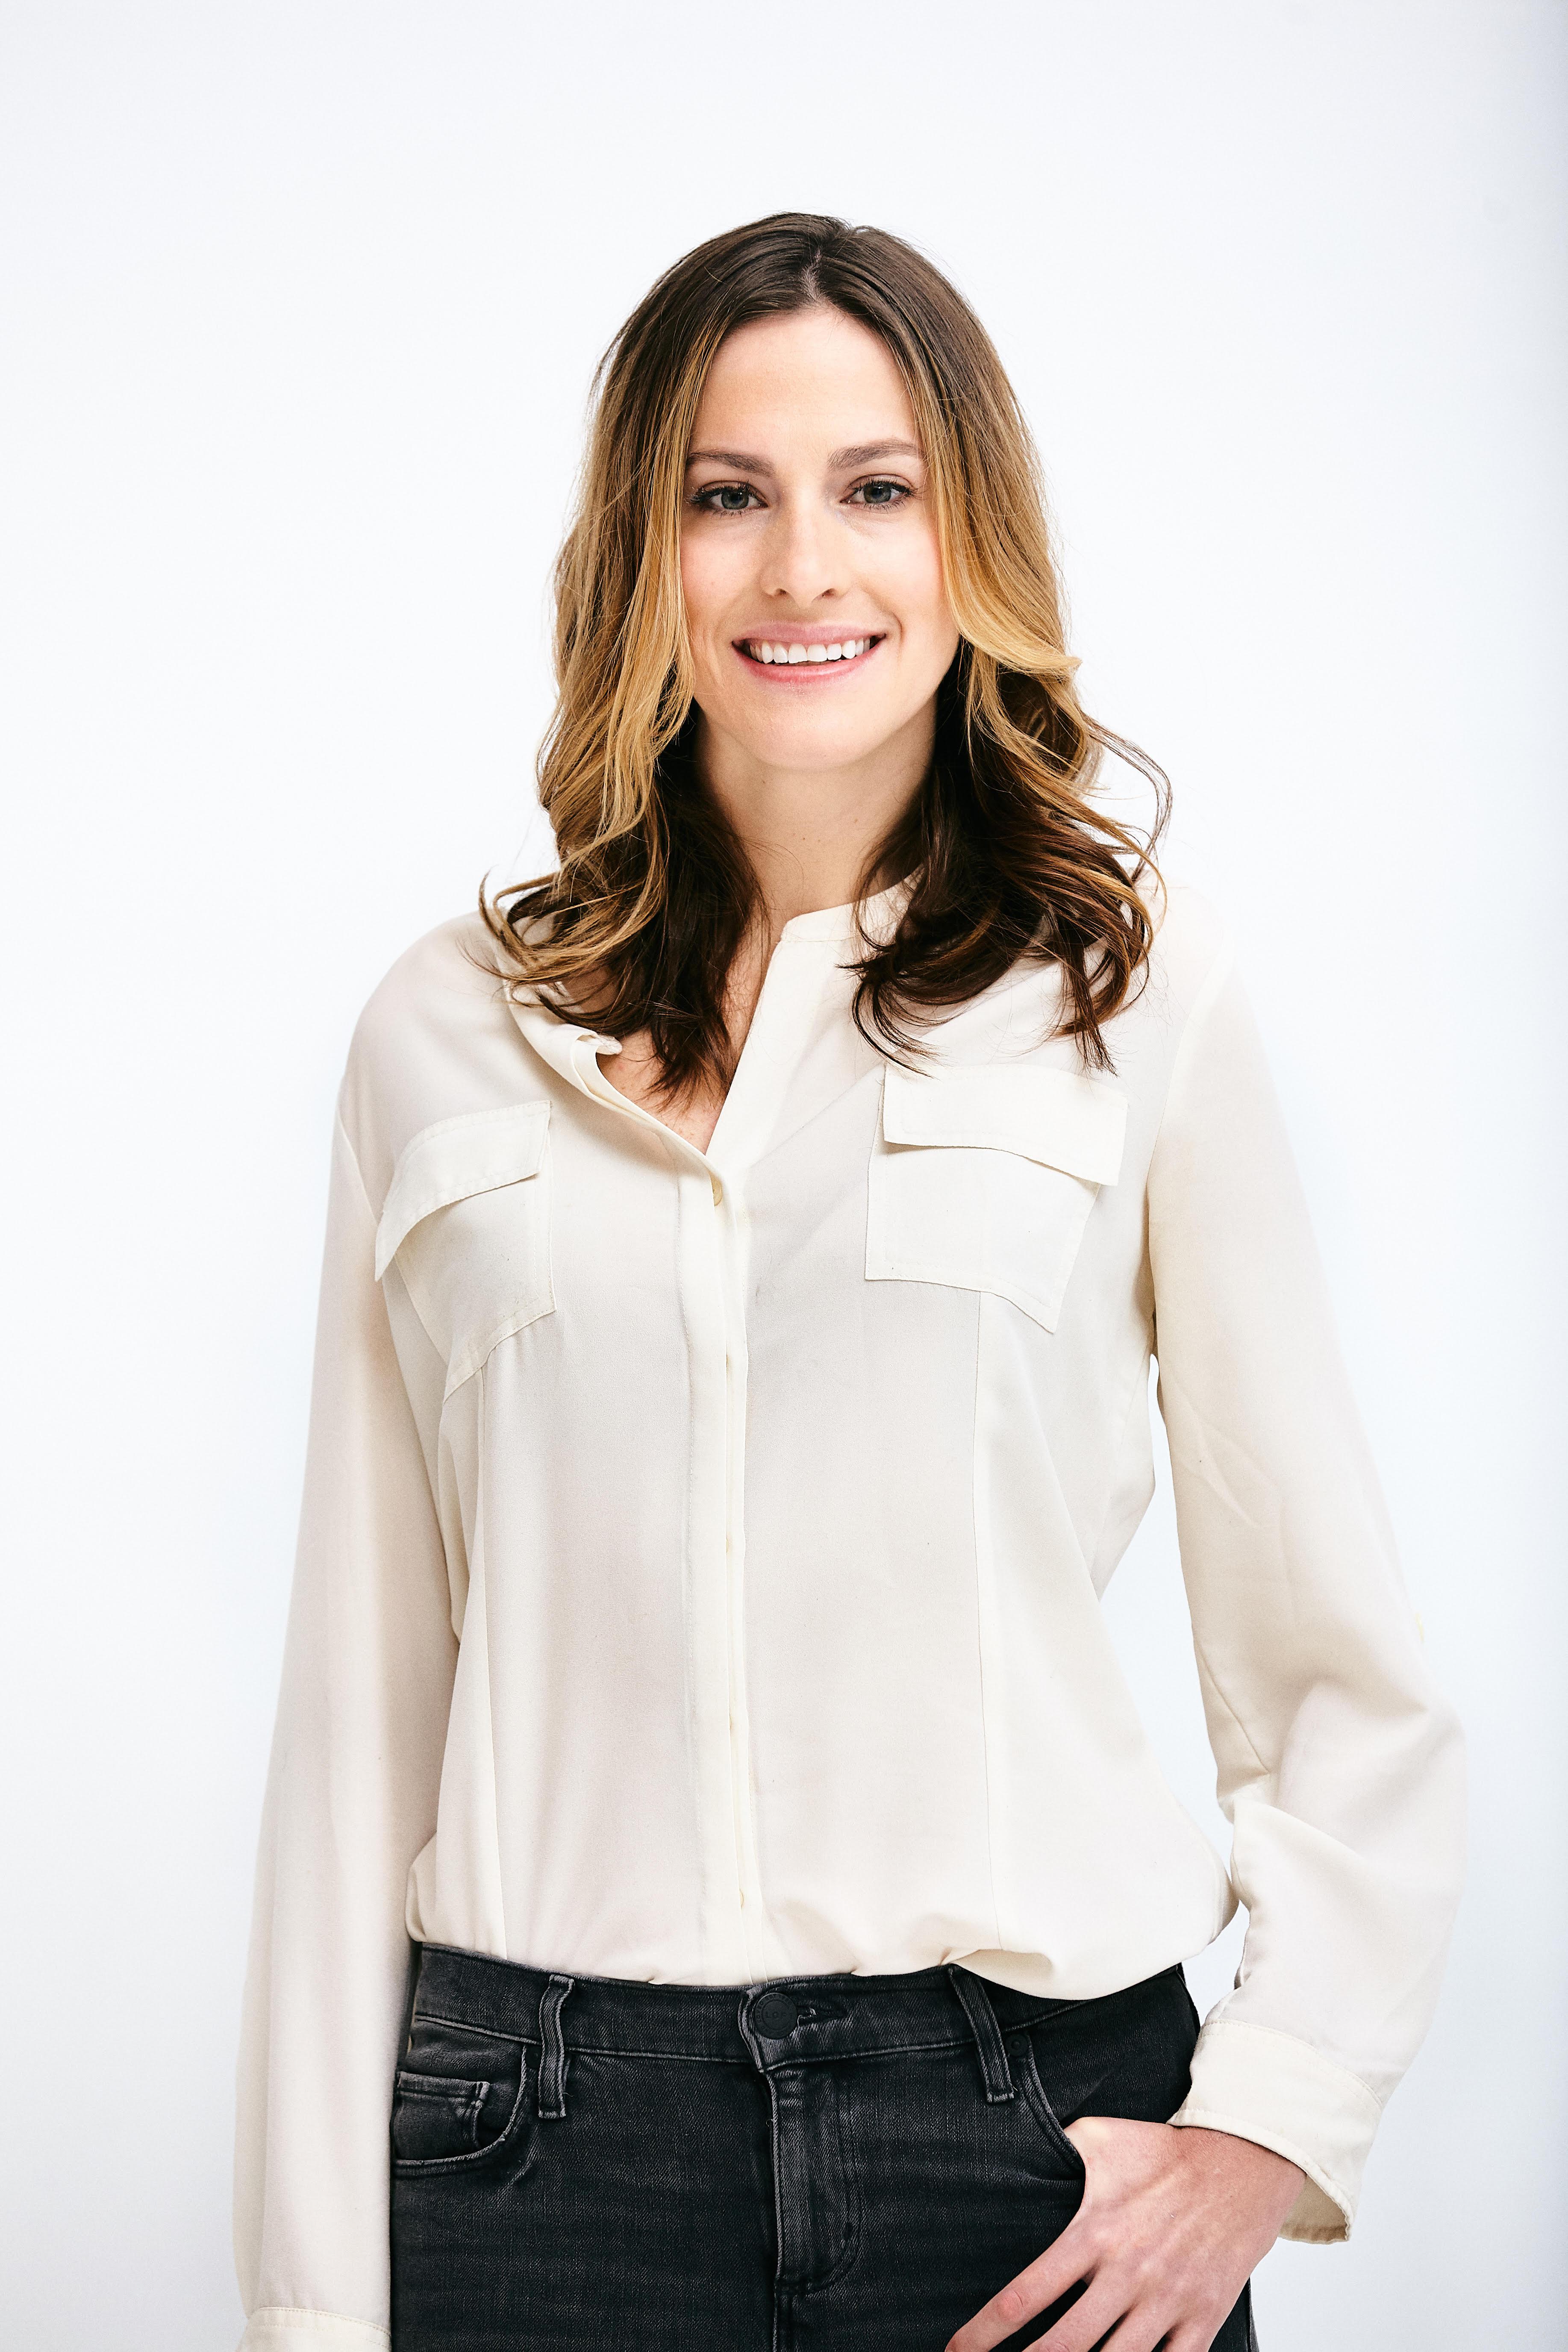 Christina Mallon